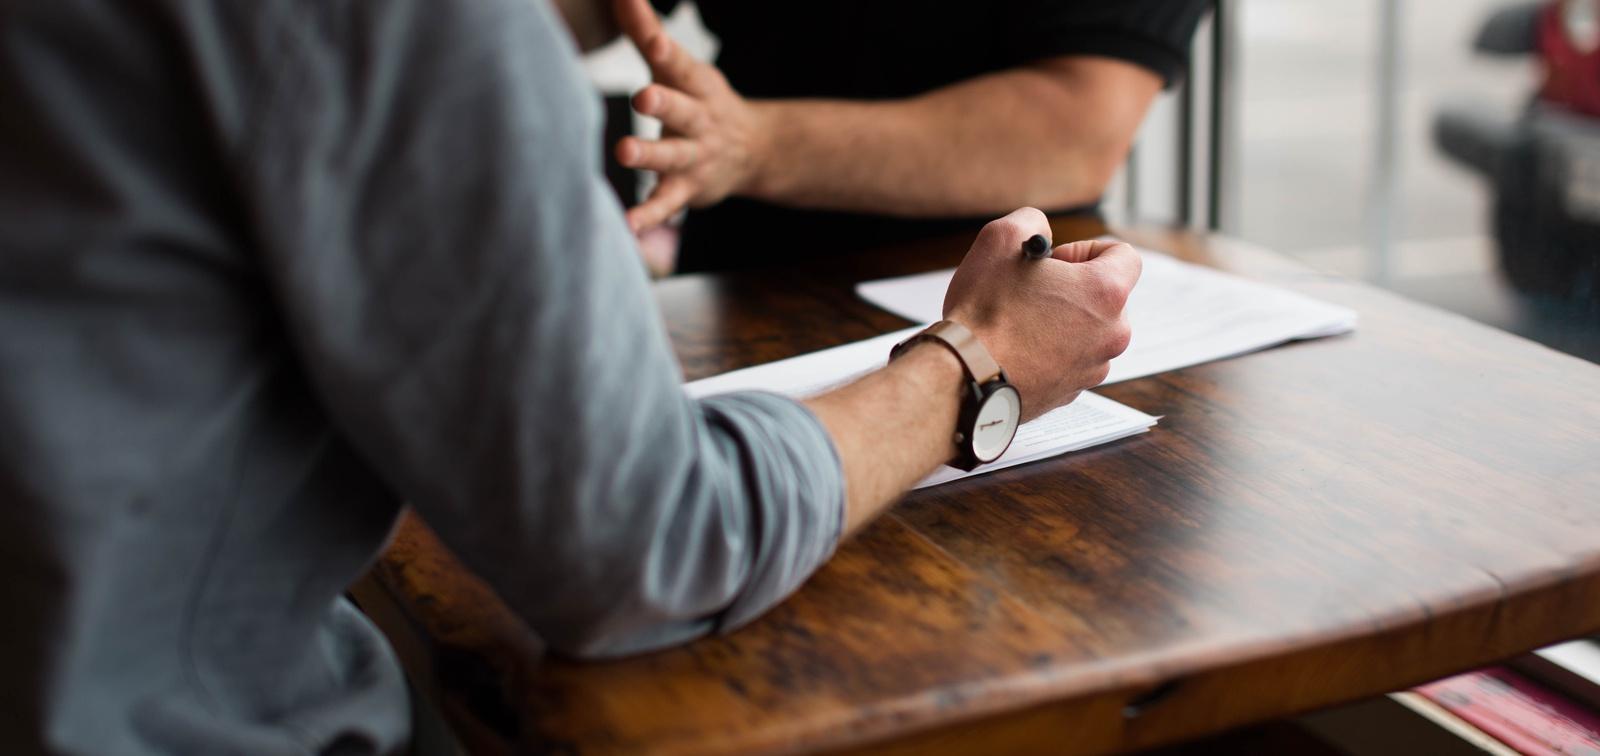 CFO collaboration with CIO is crucial amid COVID-19